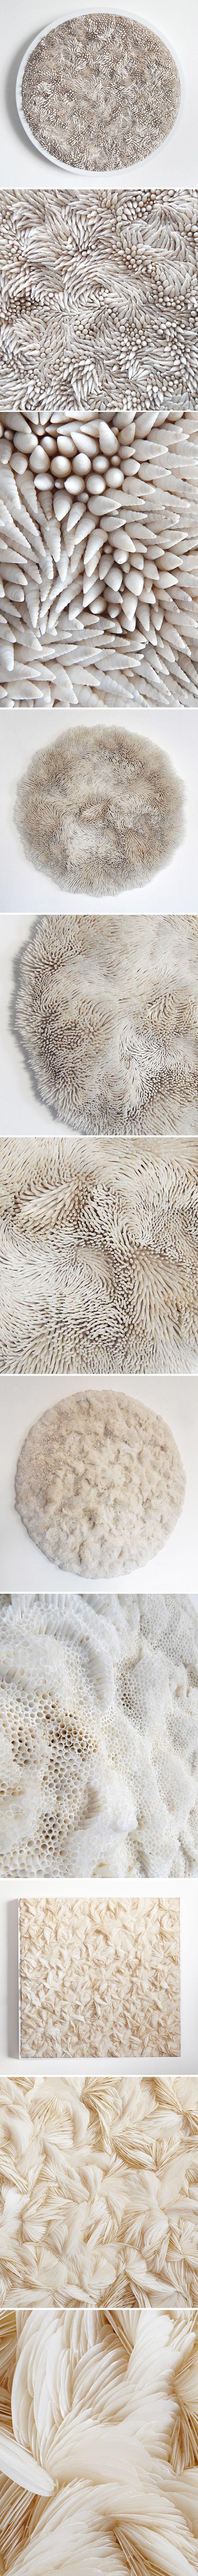 The Jealous Curator /// curated contemporary art  /// rowan mersh